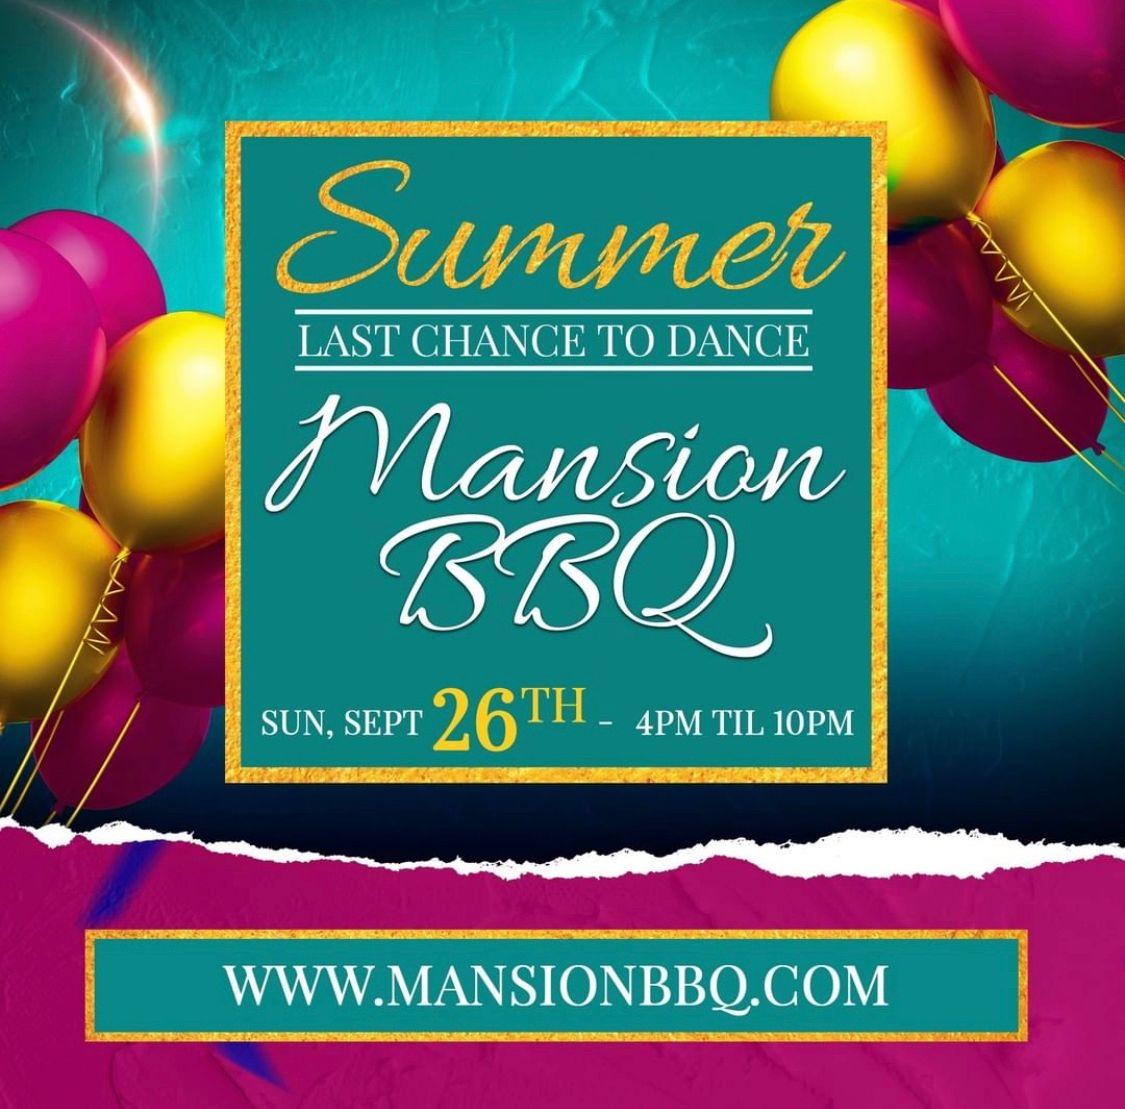 Mansion BBQ   Last Chance To Dance